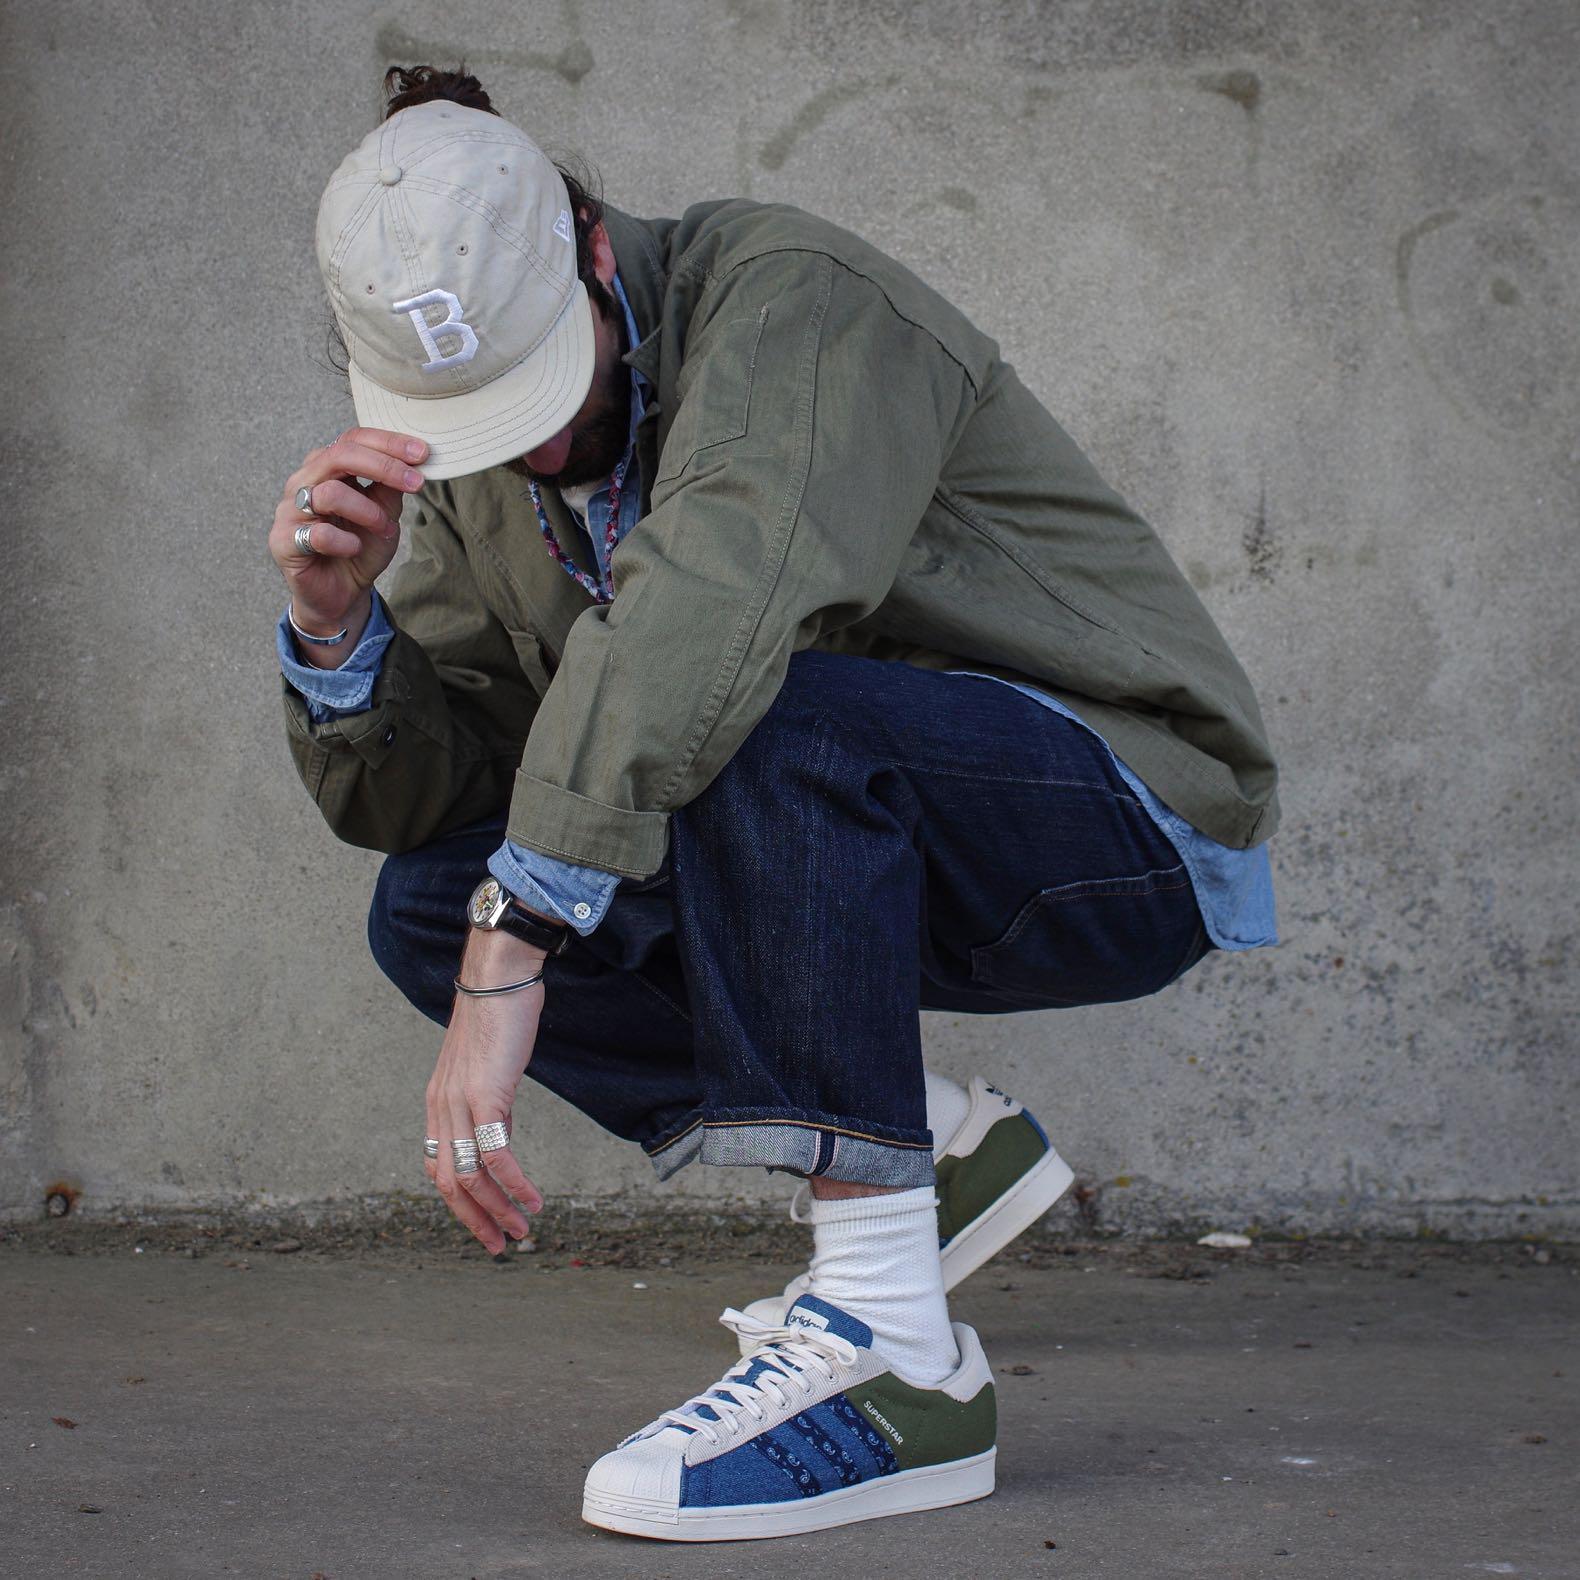 homme dans un style streetweat street heritage avec des adidas superstar patchwork